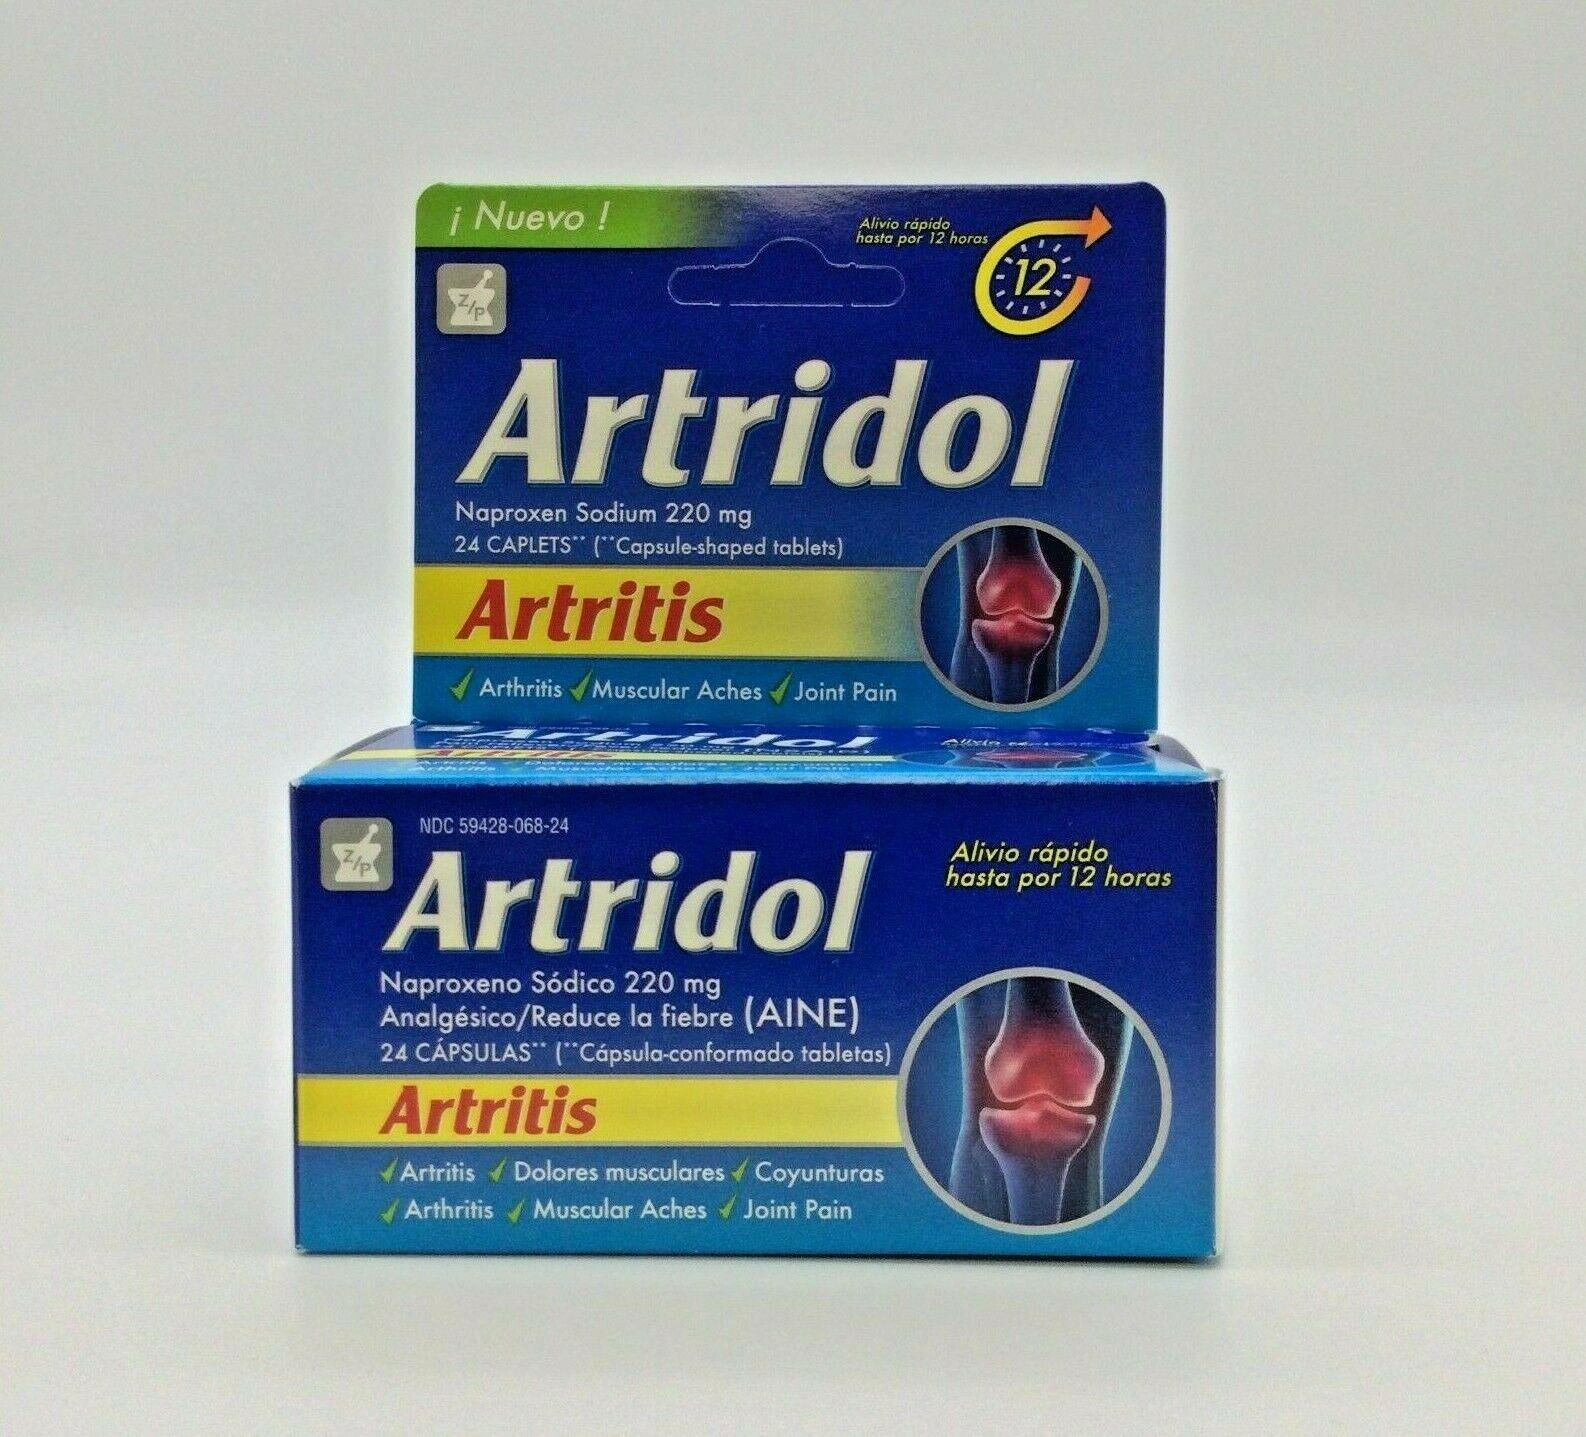 1 Artridol Arthritis 24 Caps / 1 Artridol Artritis 24 Caps